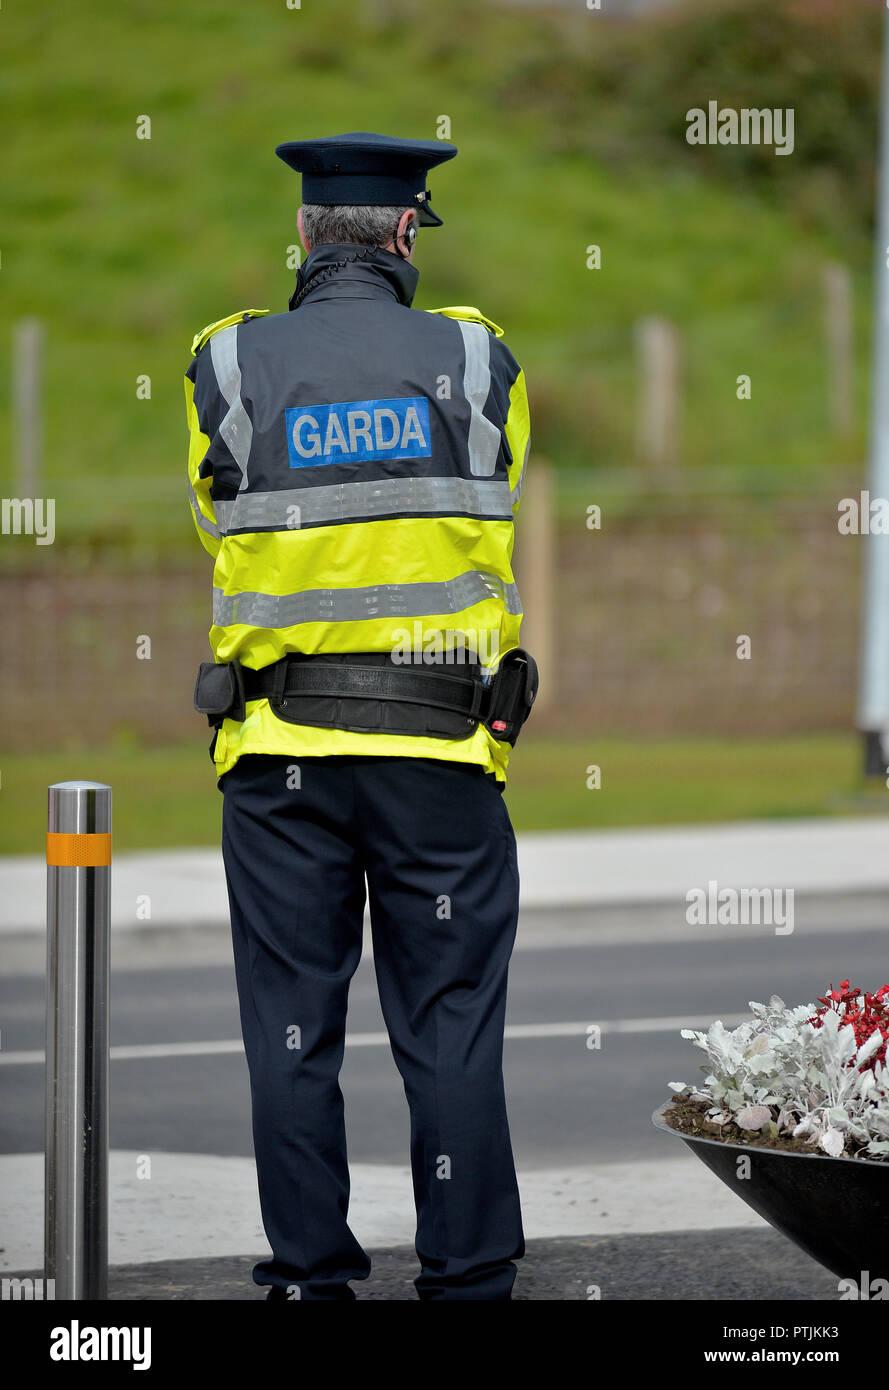 Member of the An Garda Siochana, Irish police, on duty in Buncrana, County Donegal, Ireland. ©George Sweeney / Alamy Stock Photo